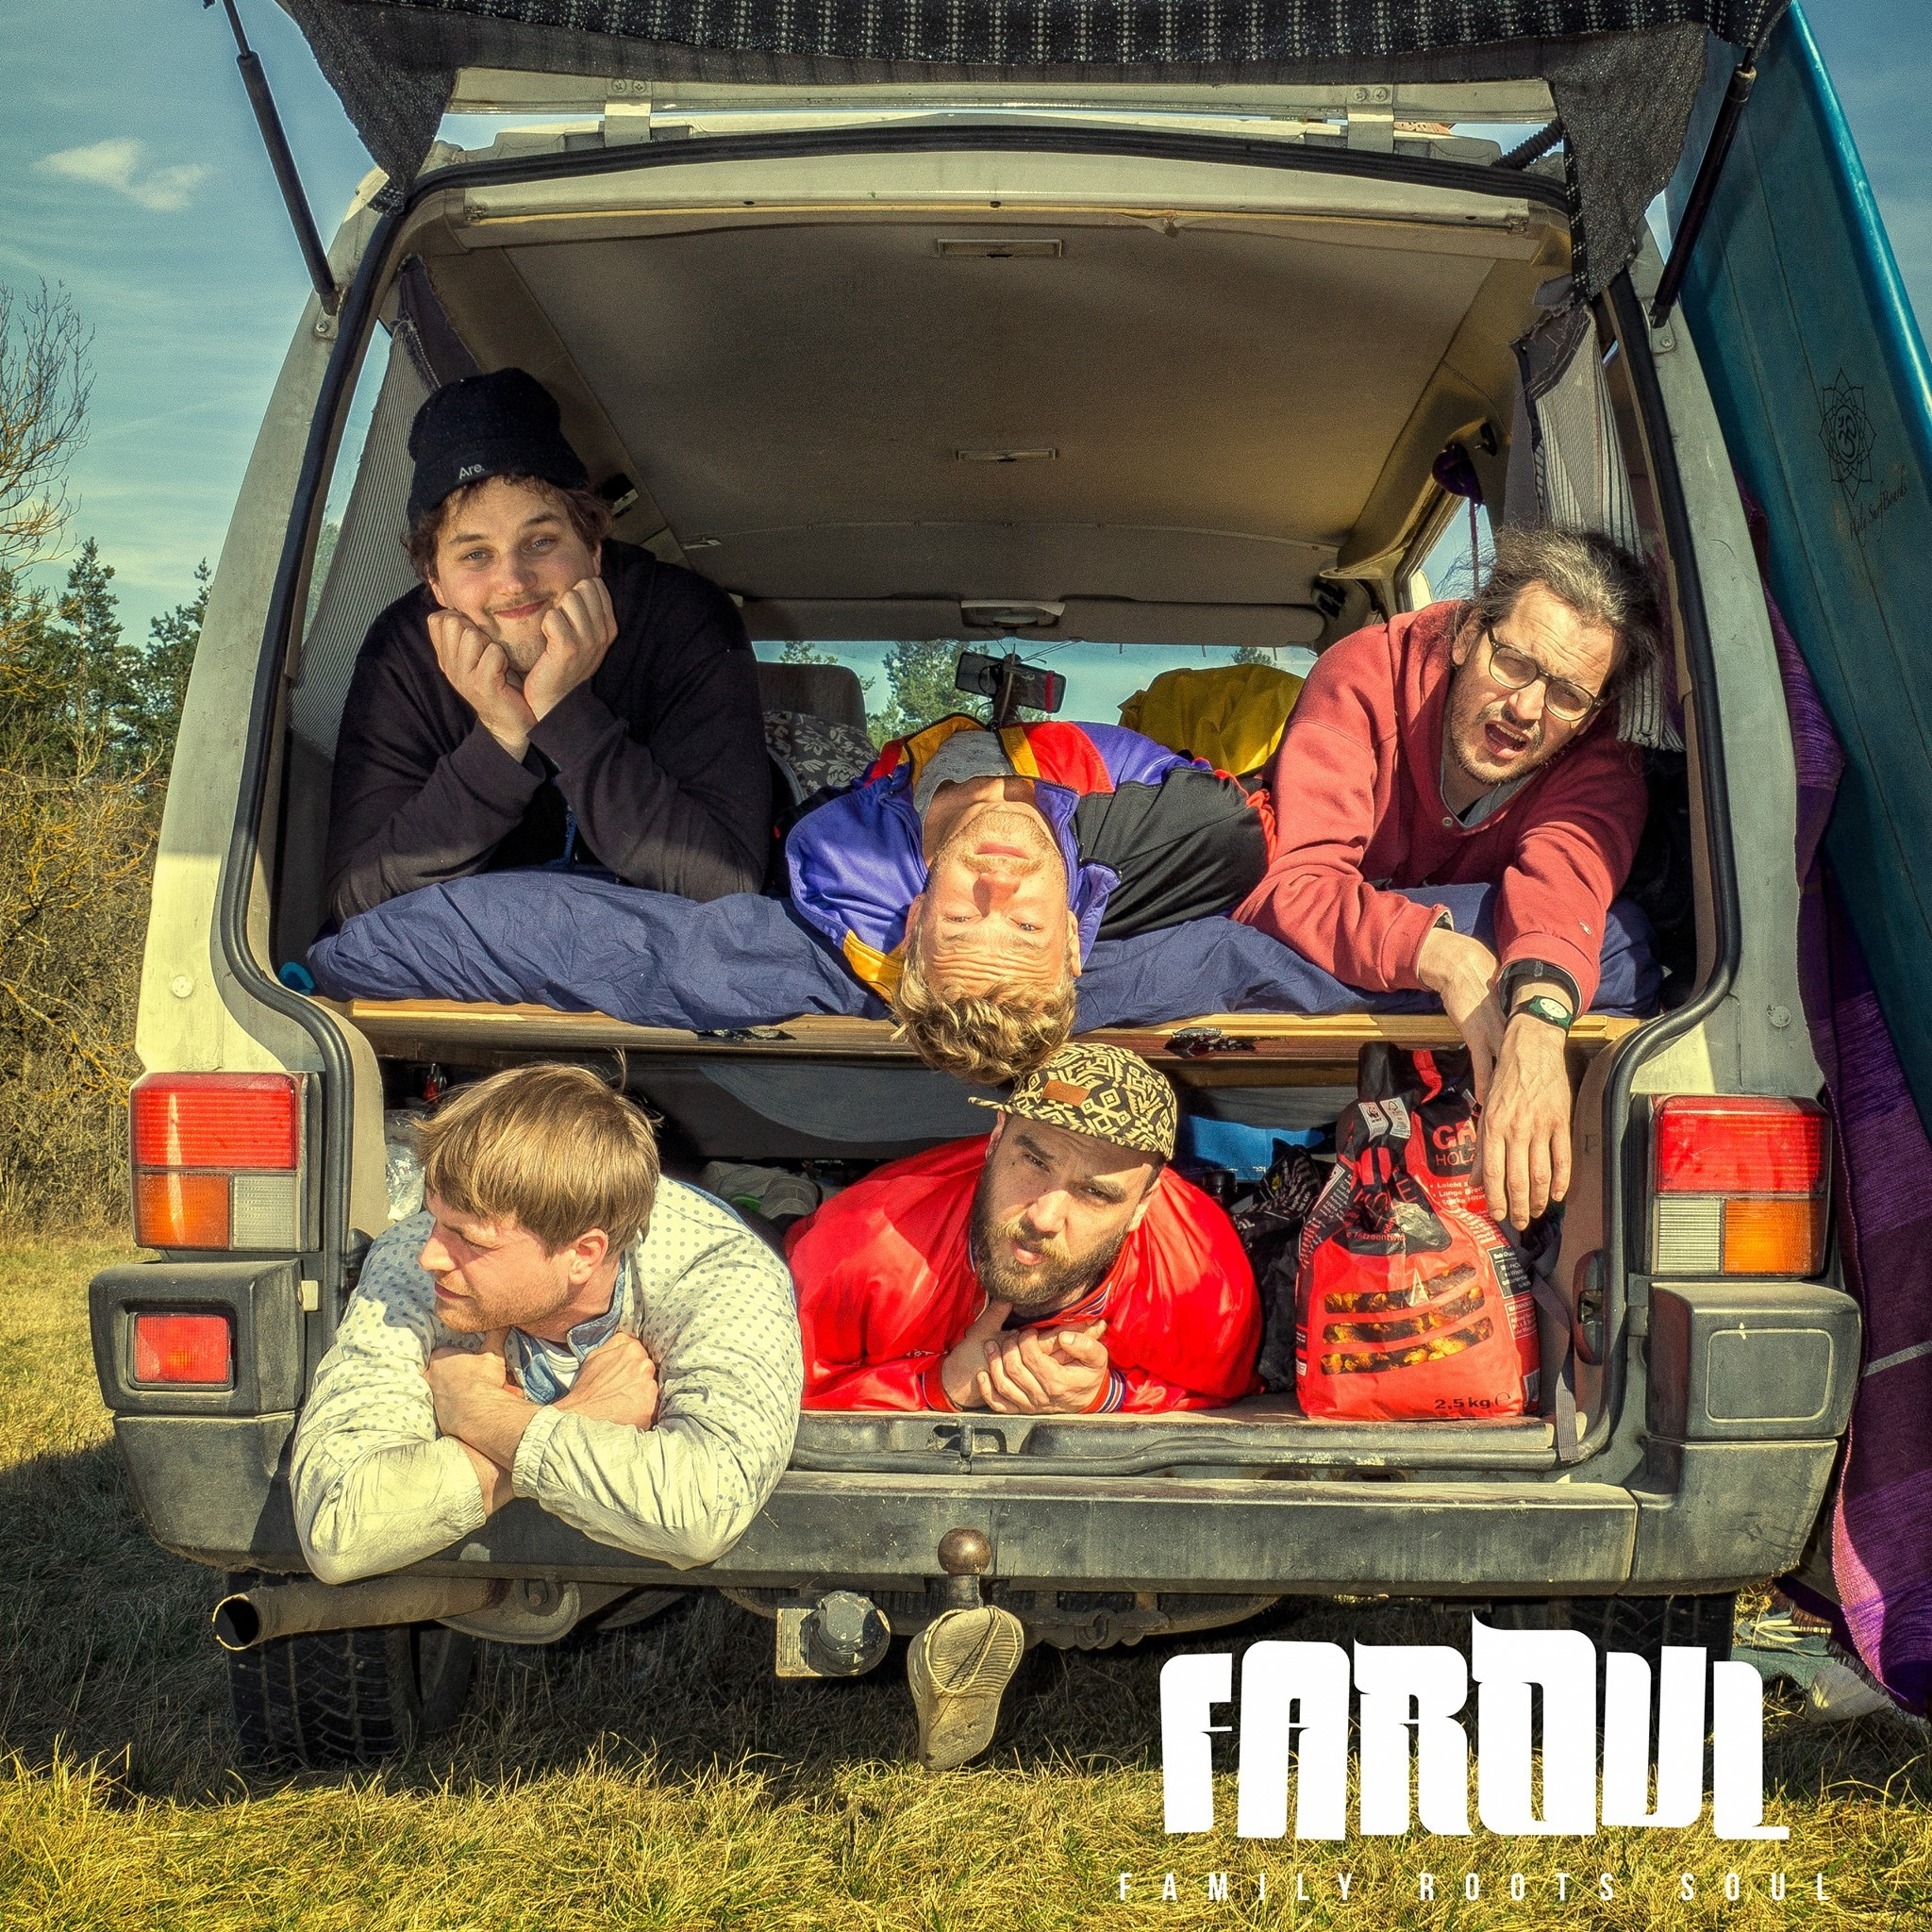 Image of Faroul